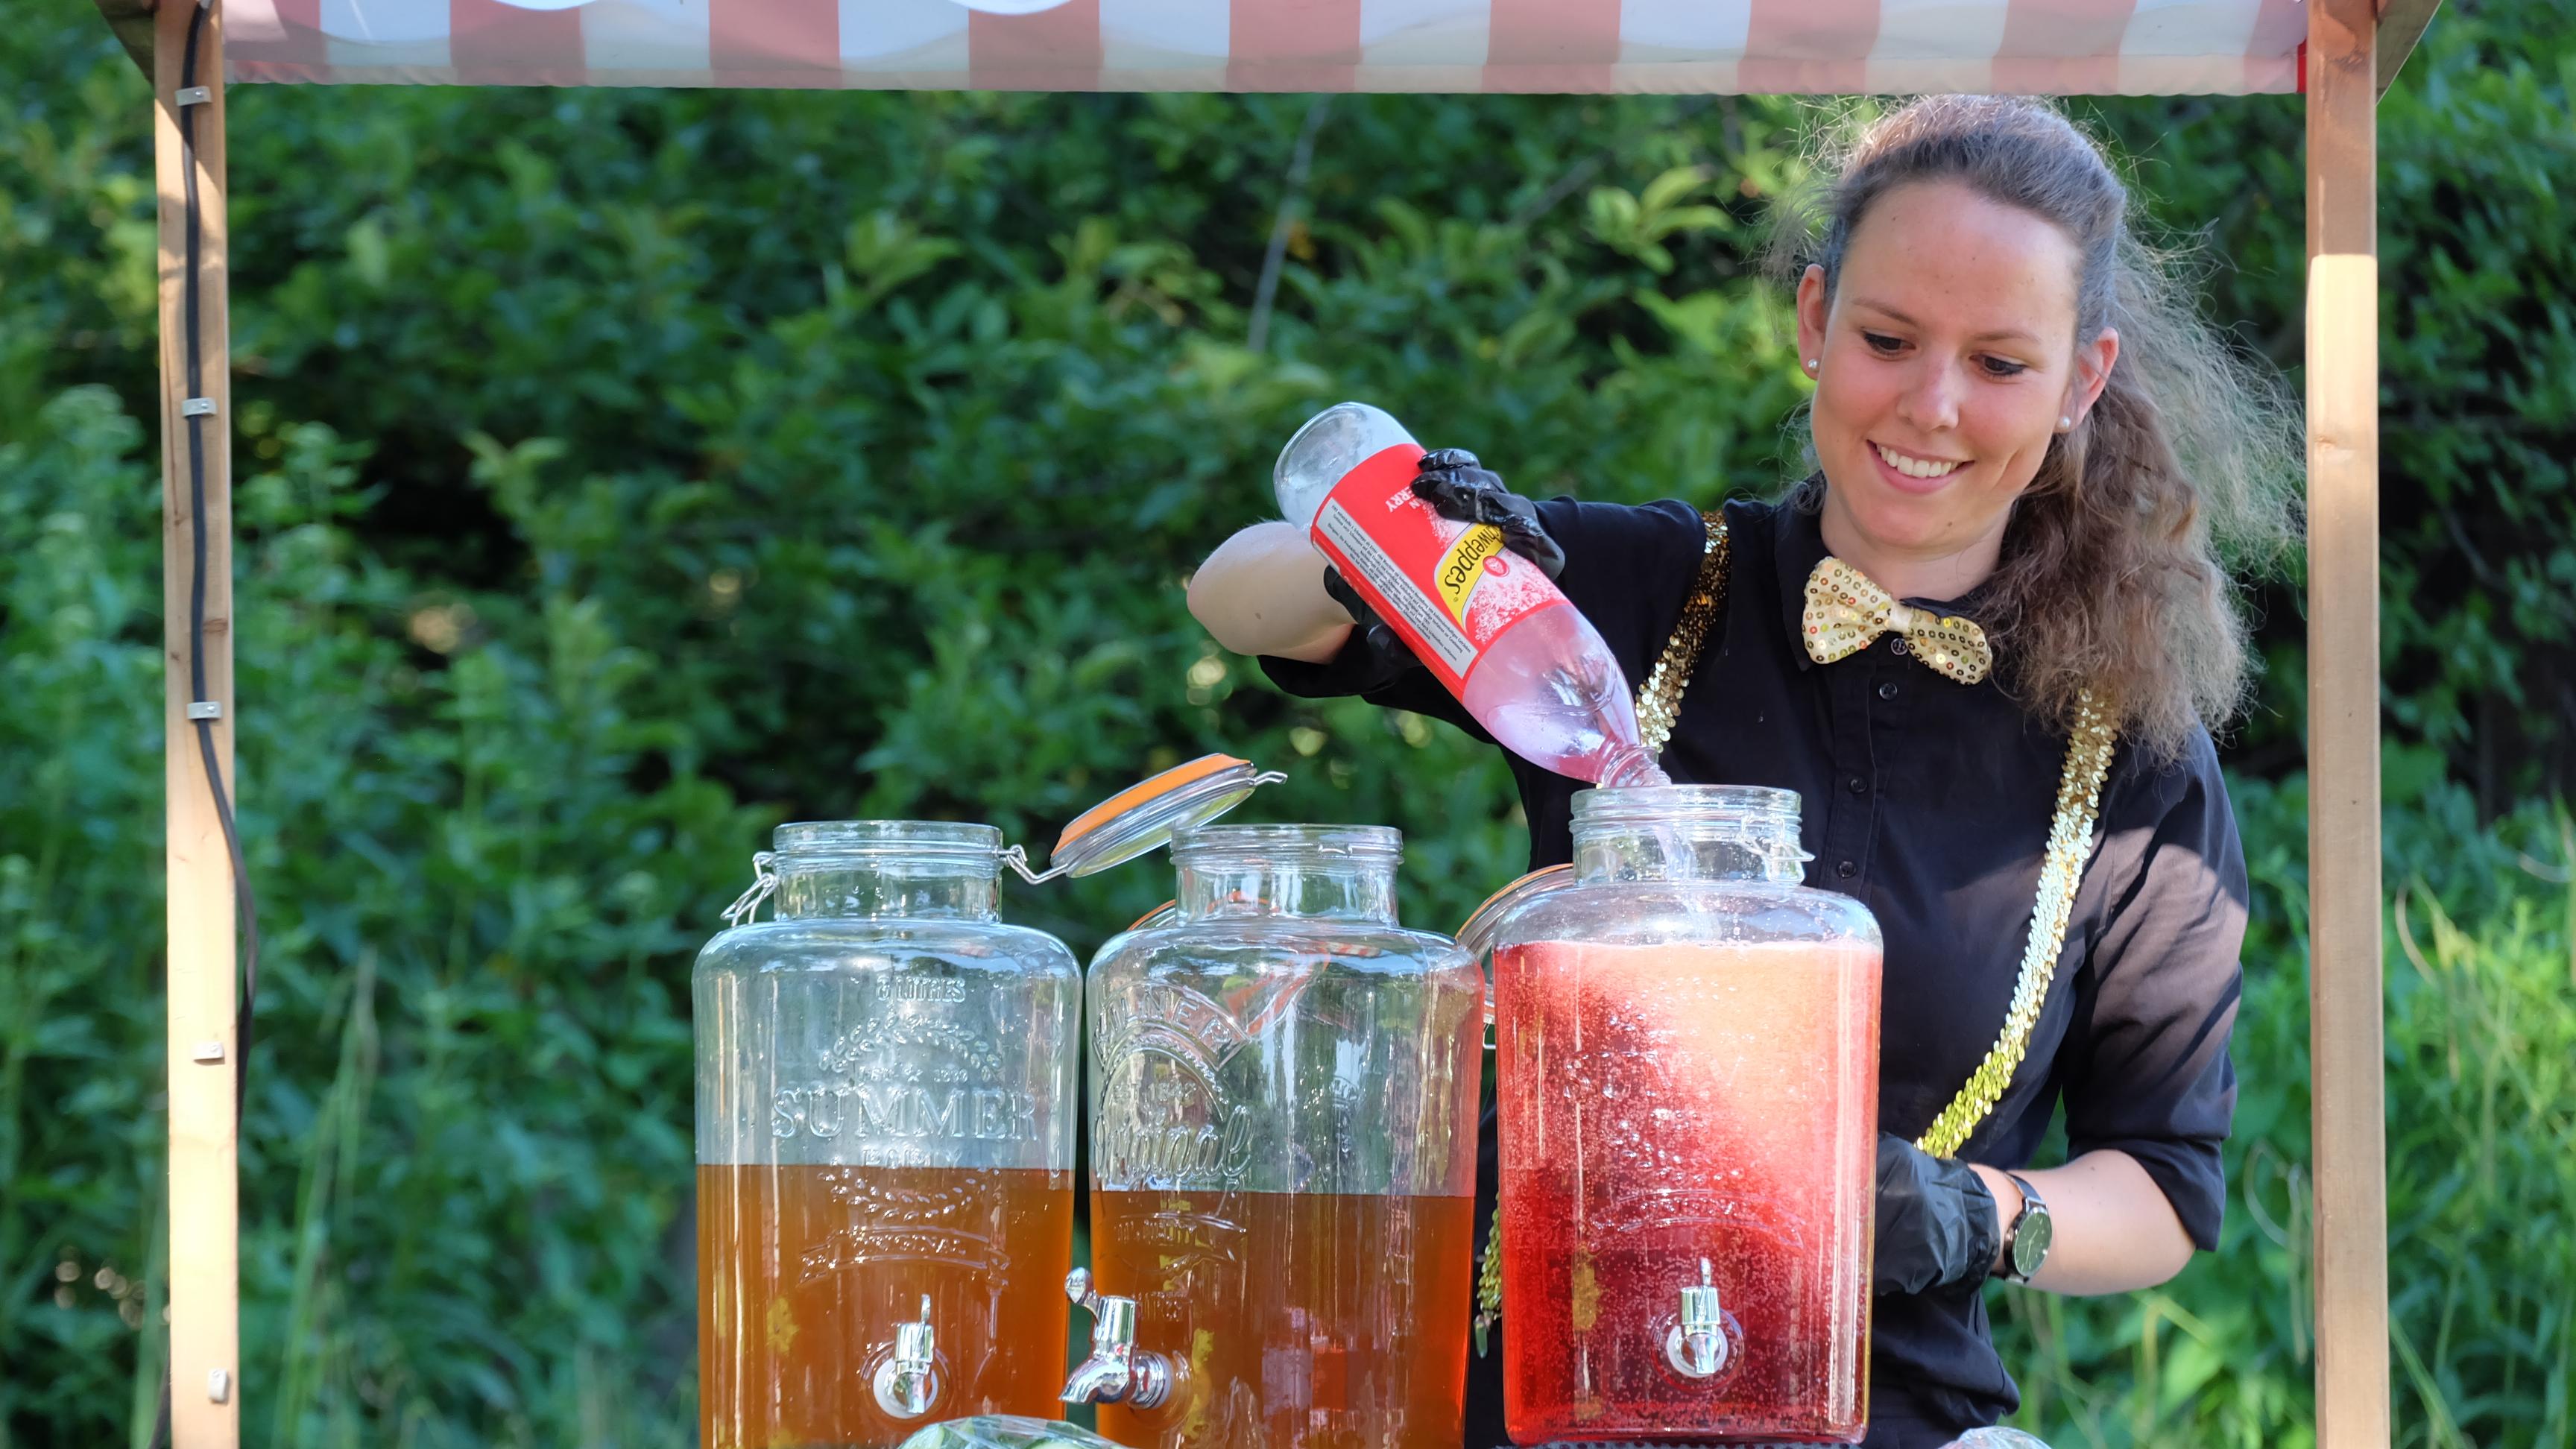 Gauls Catering Sommerfest 1&1 Messe Karlsruhe KMK Schwarzwaldhalle Zoo